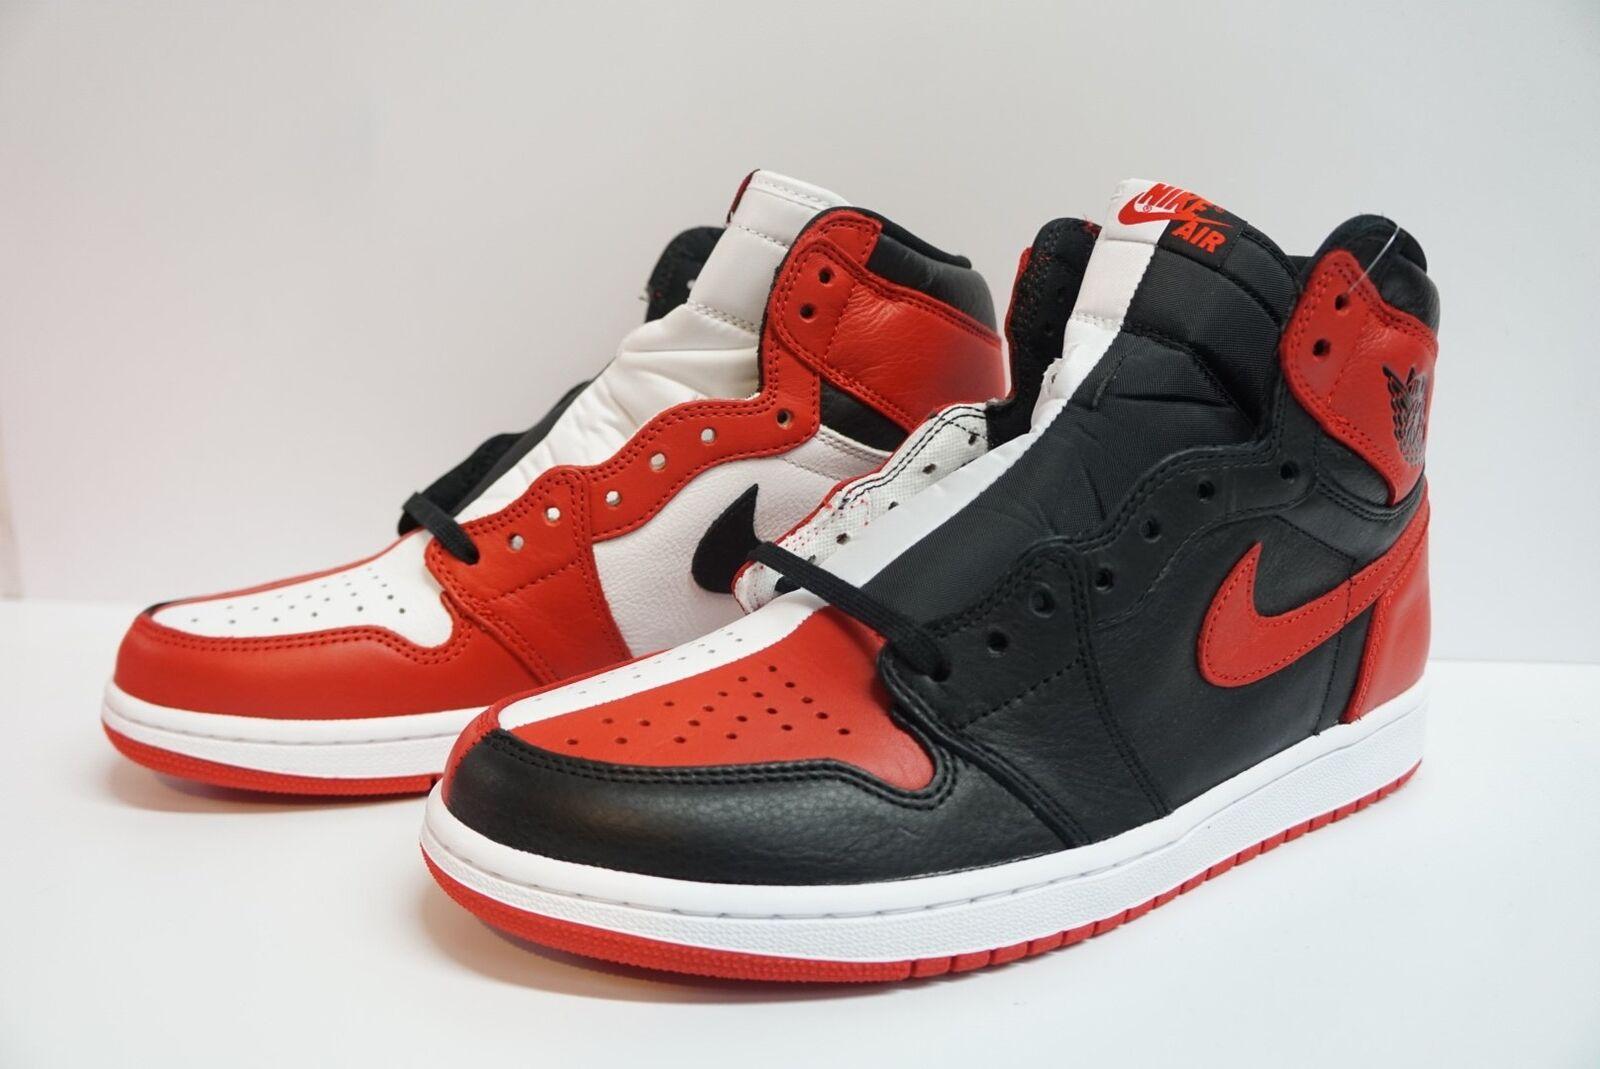 Nike Air Jordan 1 retro High og NRG SZ: a un homenaje 861428-061 SZ: NRG 6 - 14 125588